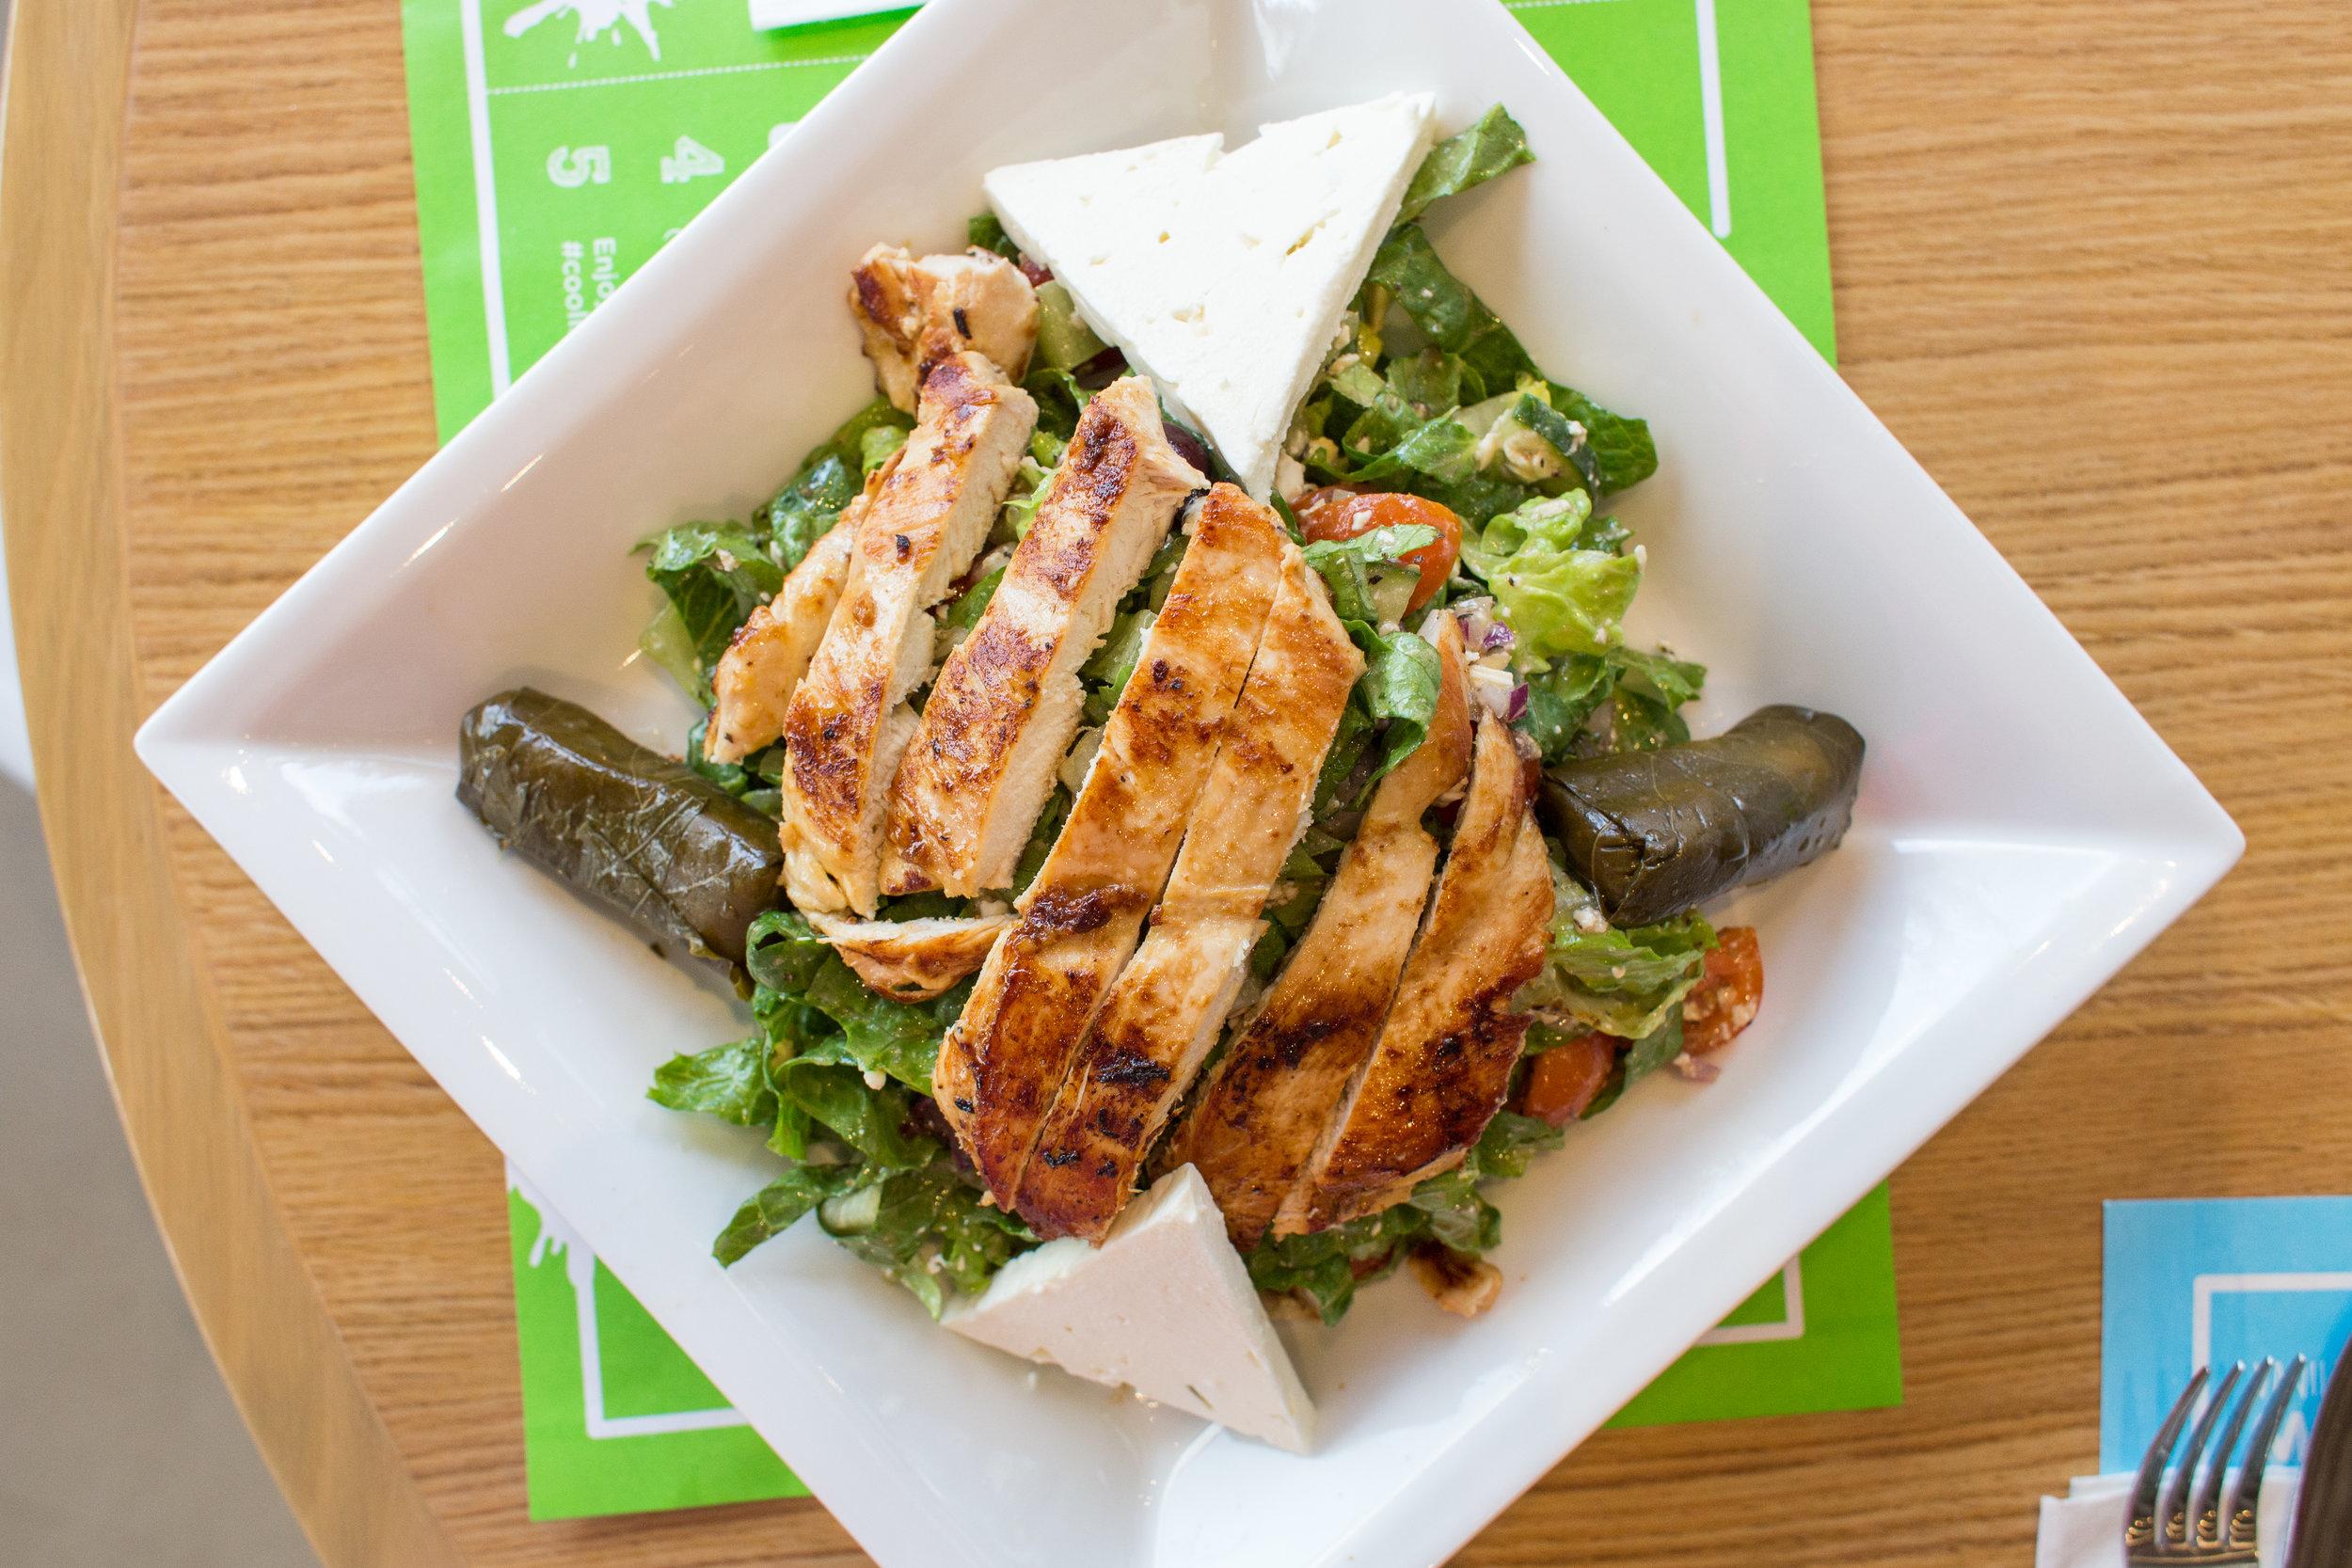 7-13-18 coolmess roslyn food-1.jpg